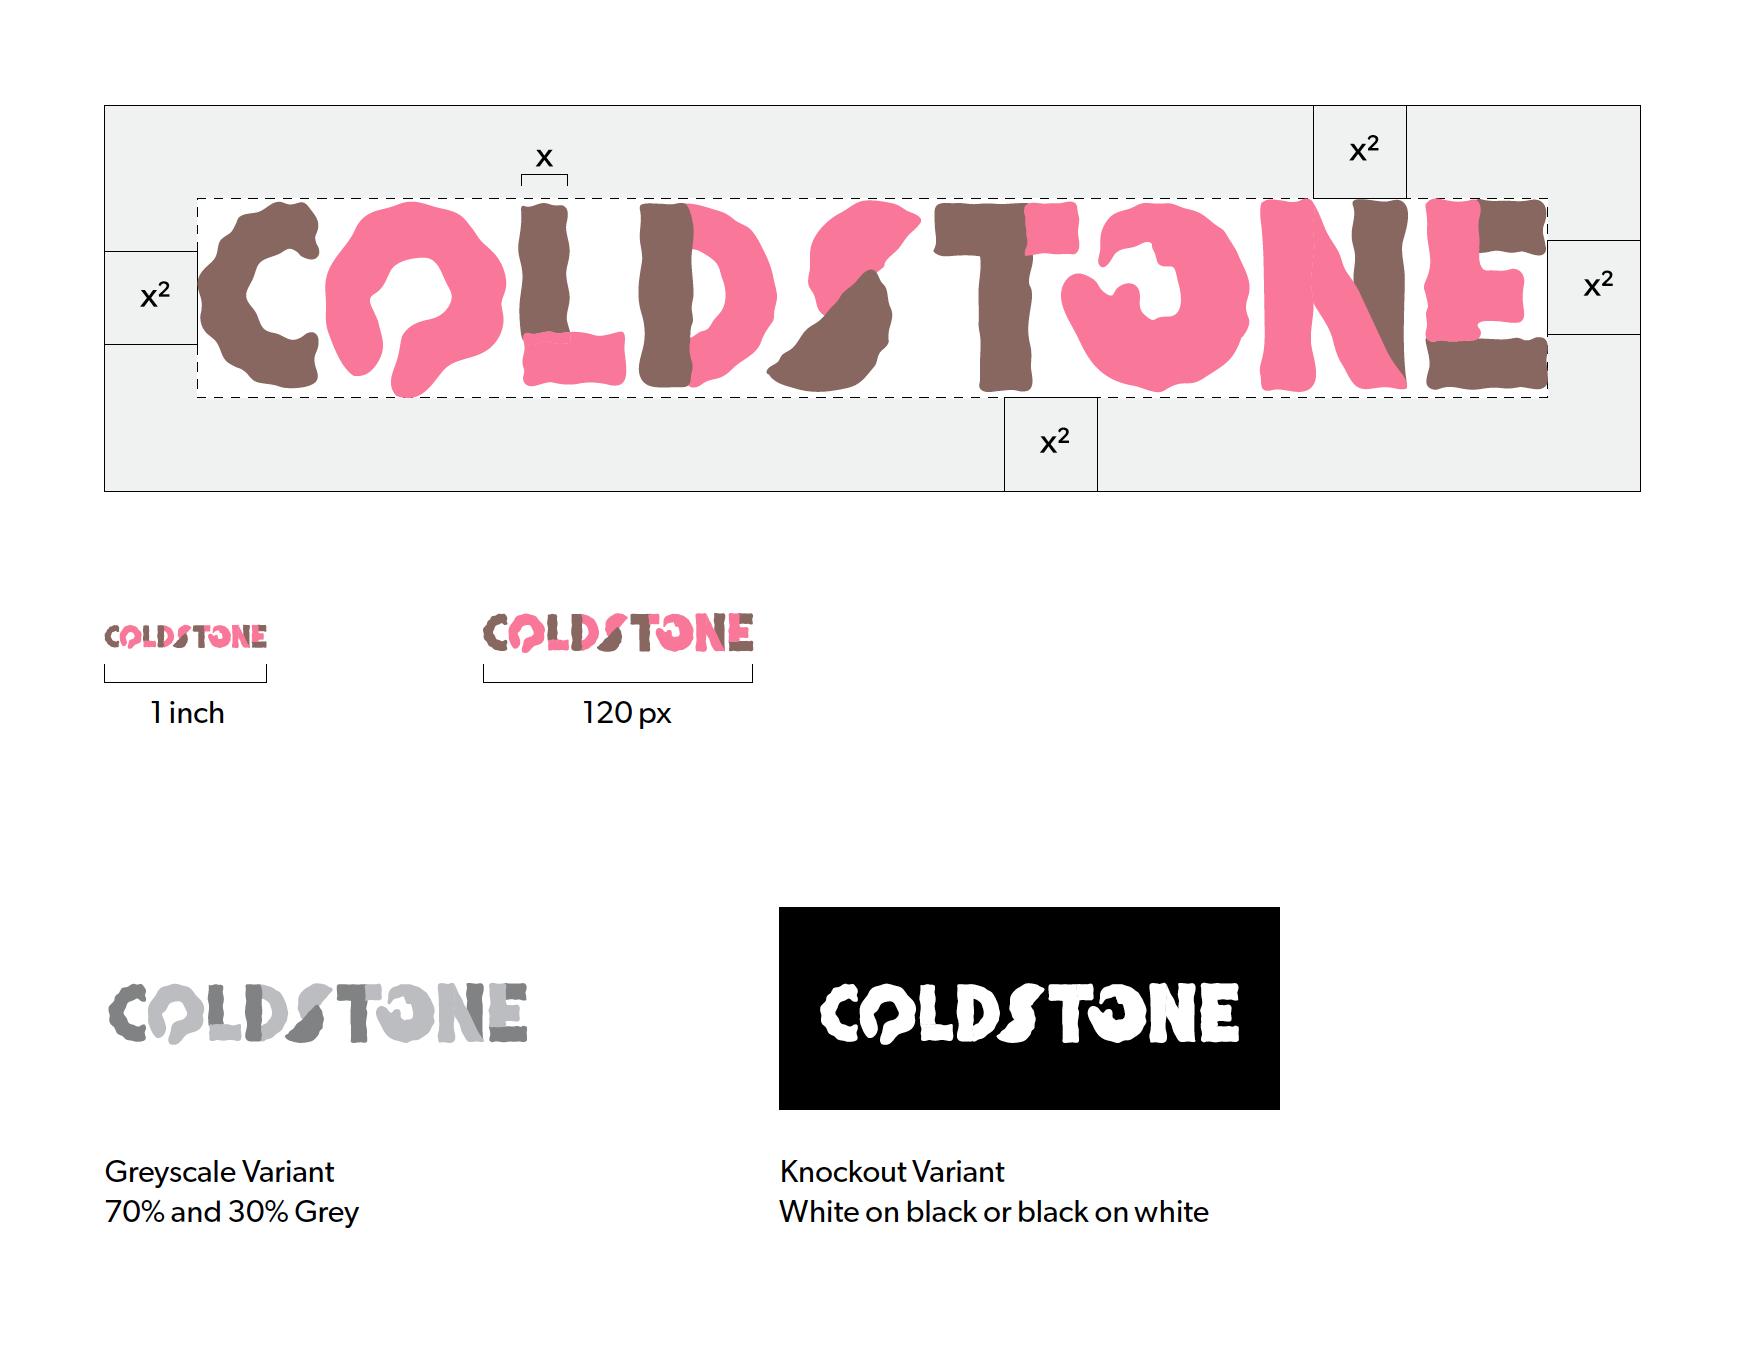 Cold Stone Creamery rebrand Signature Details